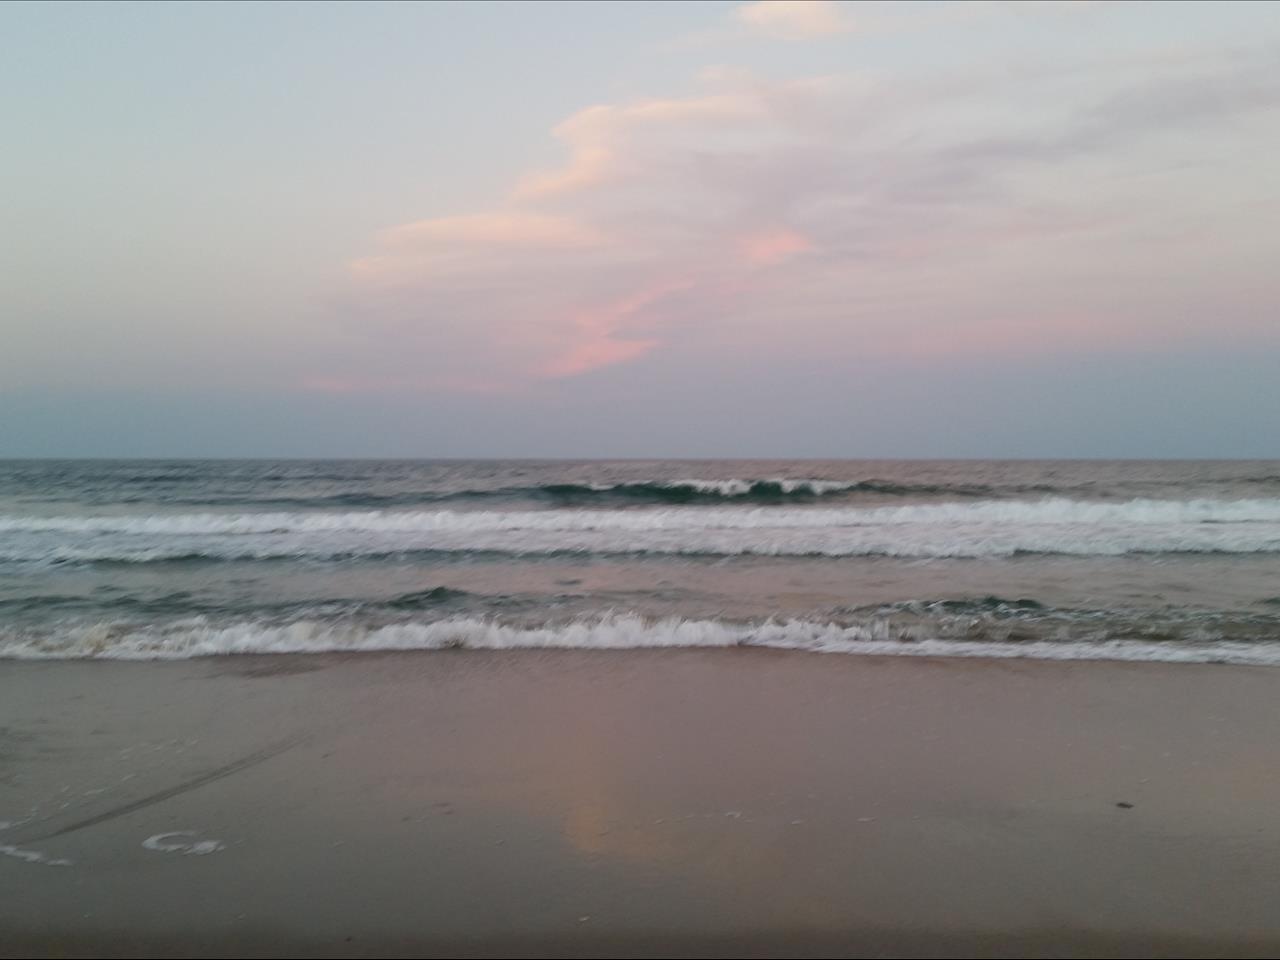 July 2015 Stay - OSI04 - Daydreams By The Sea, Amanda Wallace